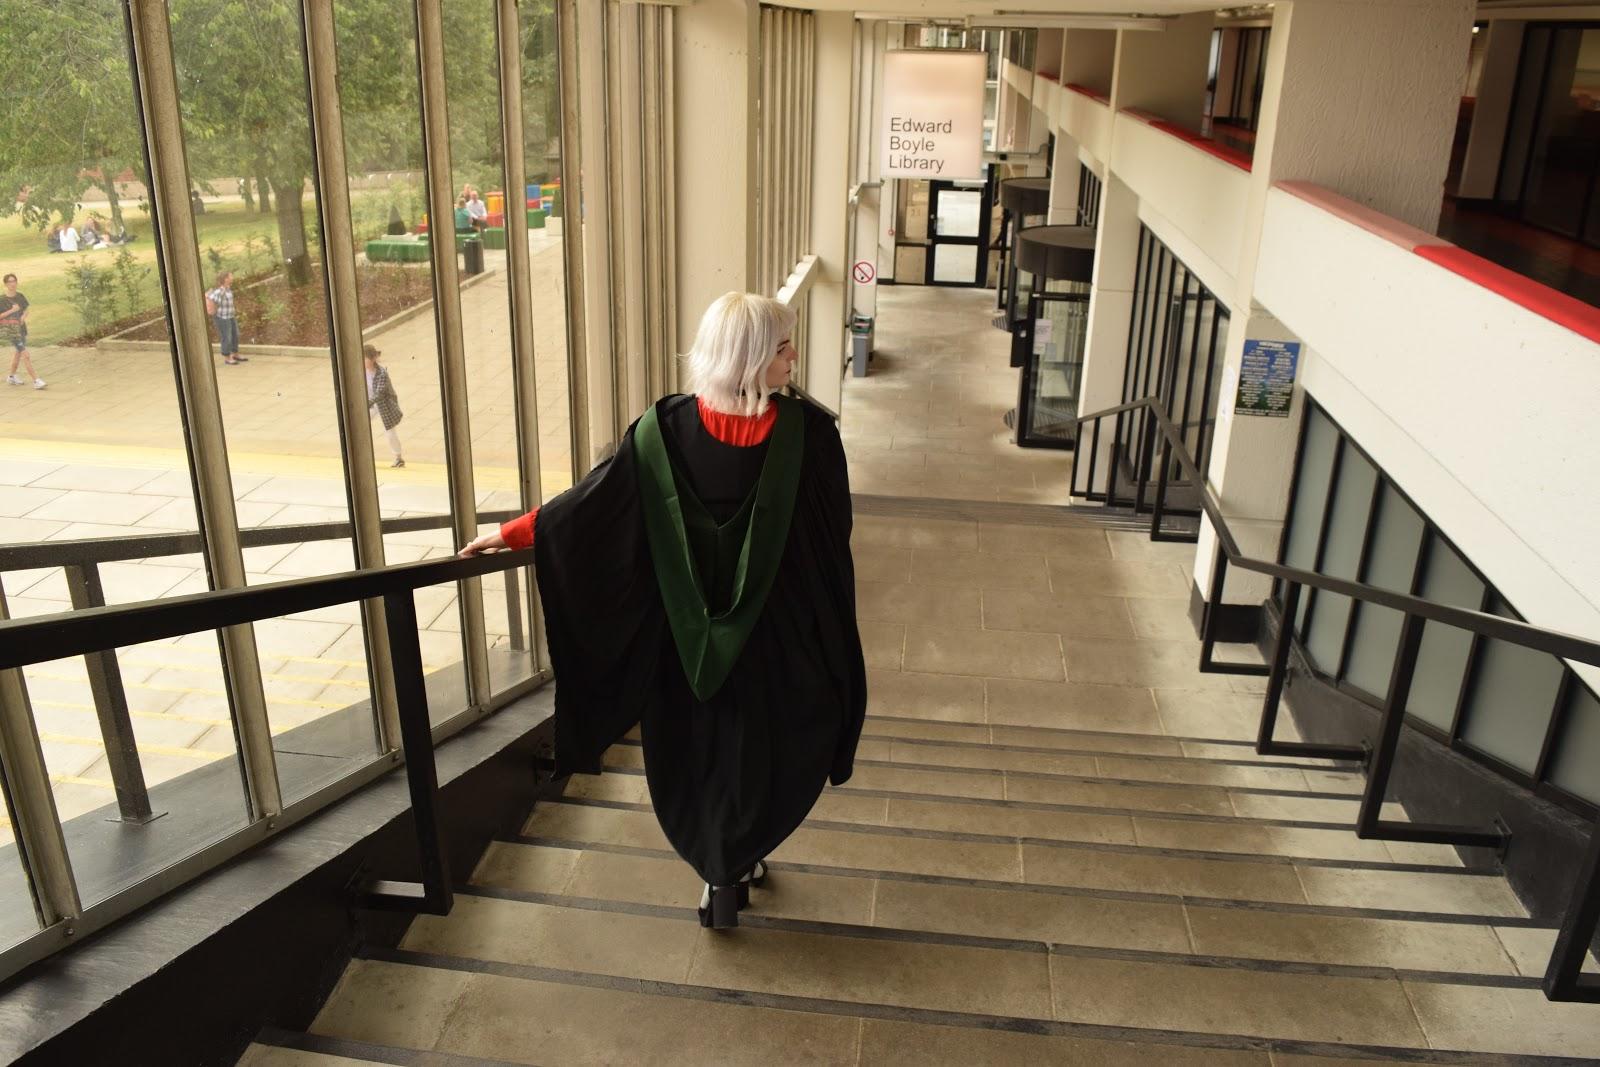 Leeds graduate in gown outside Edward Boyle Library